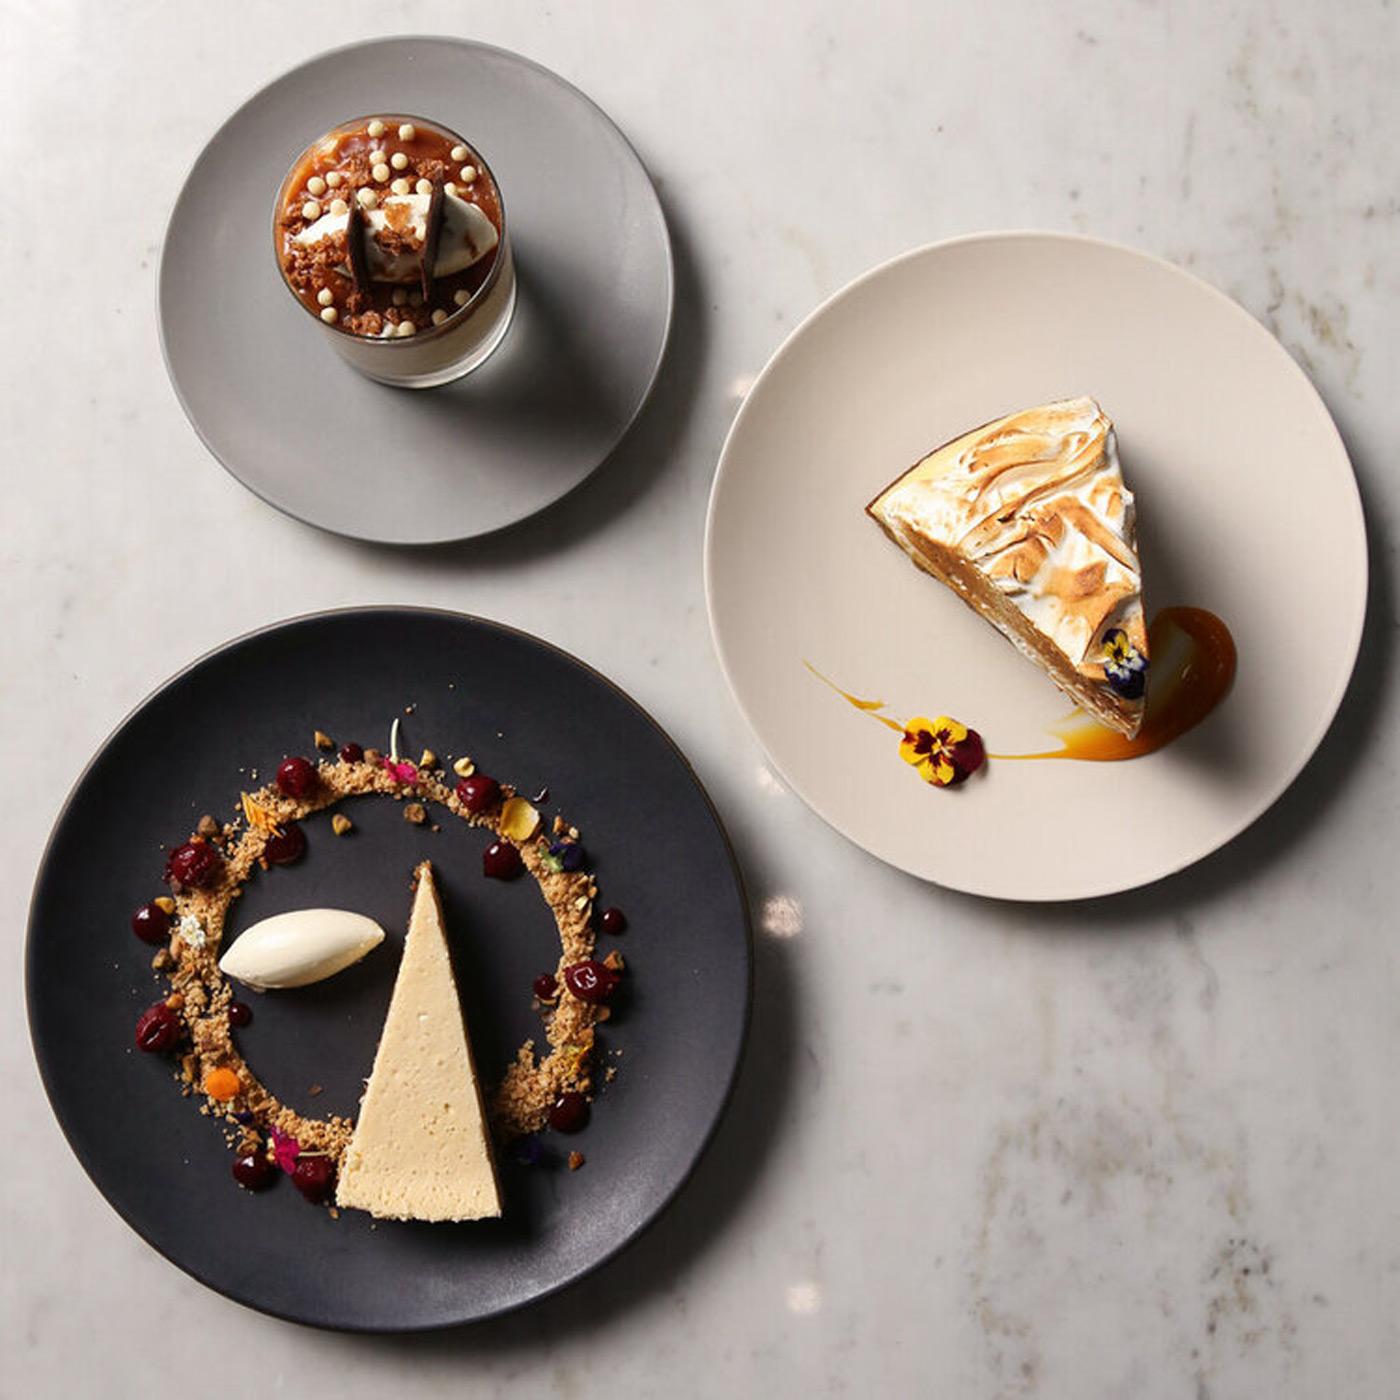 Desserts at Nick + Stef's